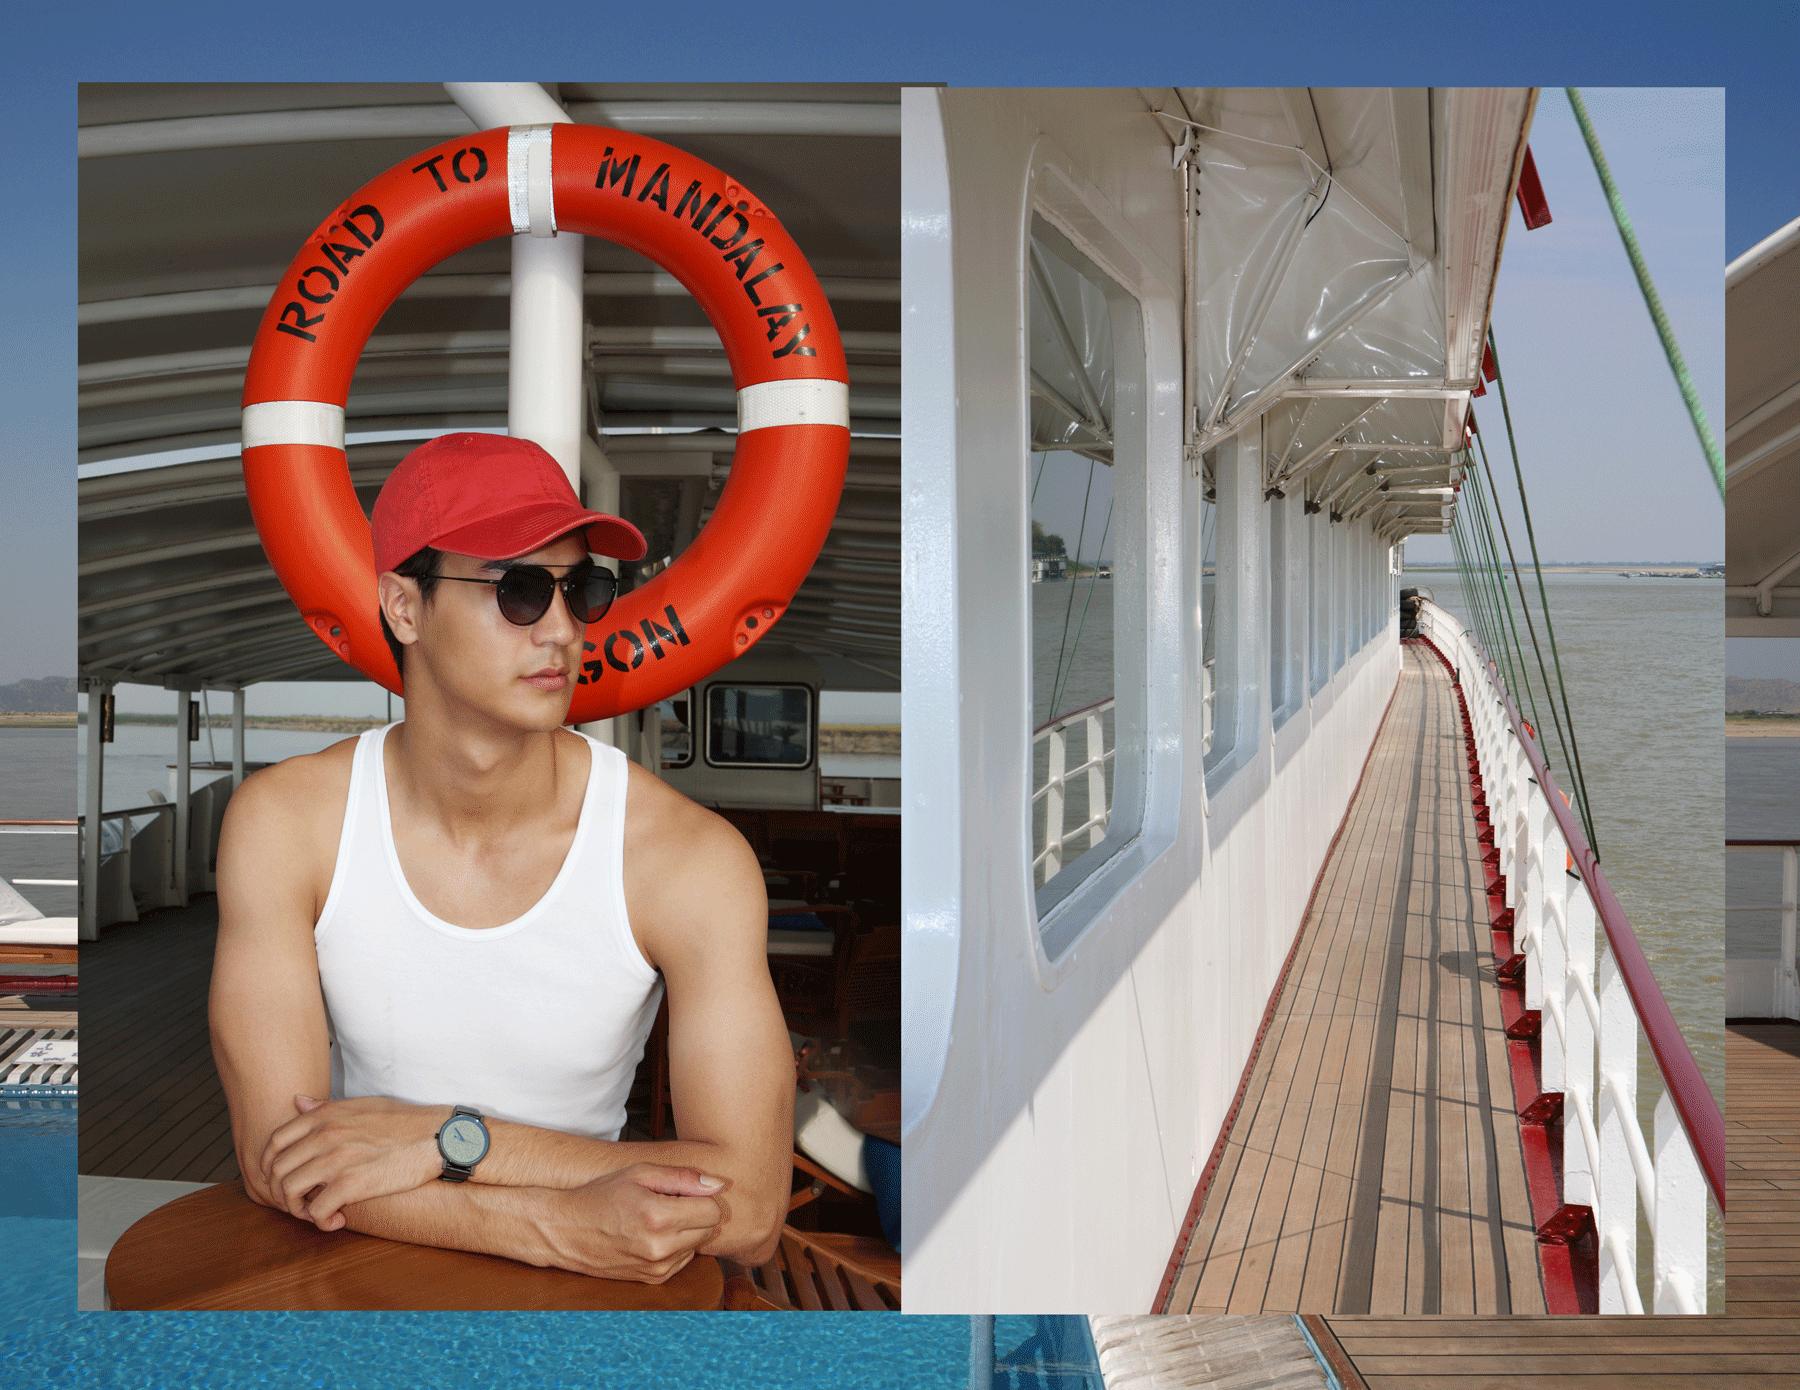 tanktop : JOCKEY / watch : FORREST / sunglasses : SPEKTRE